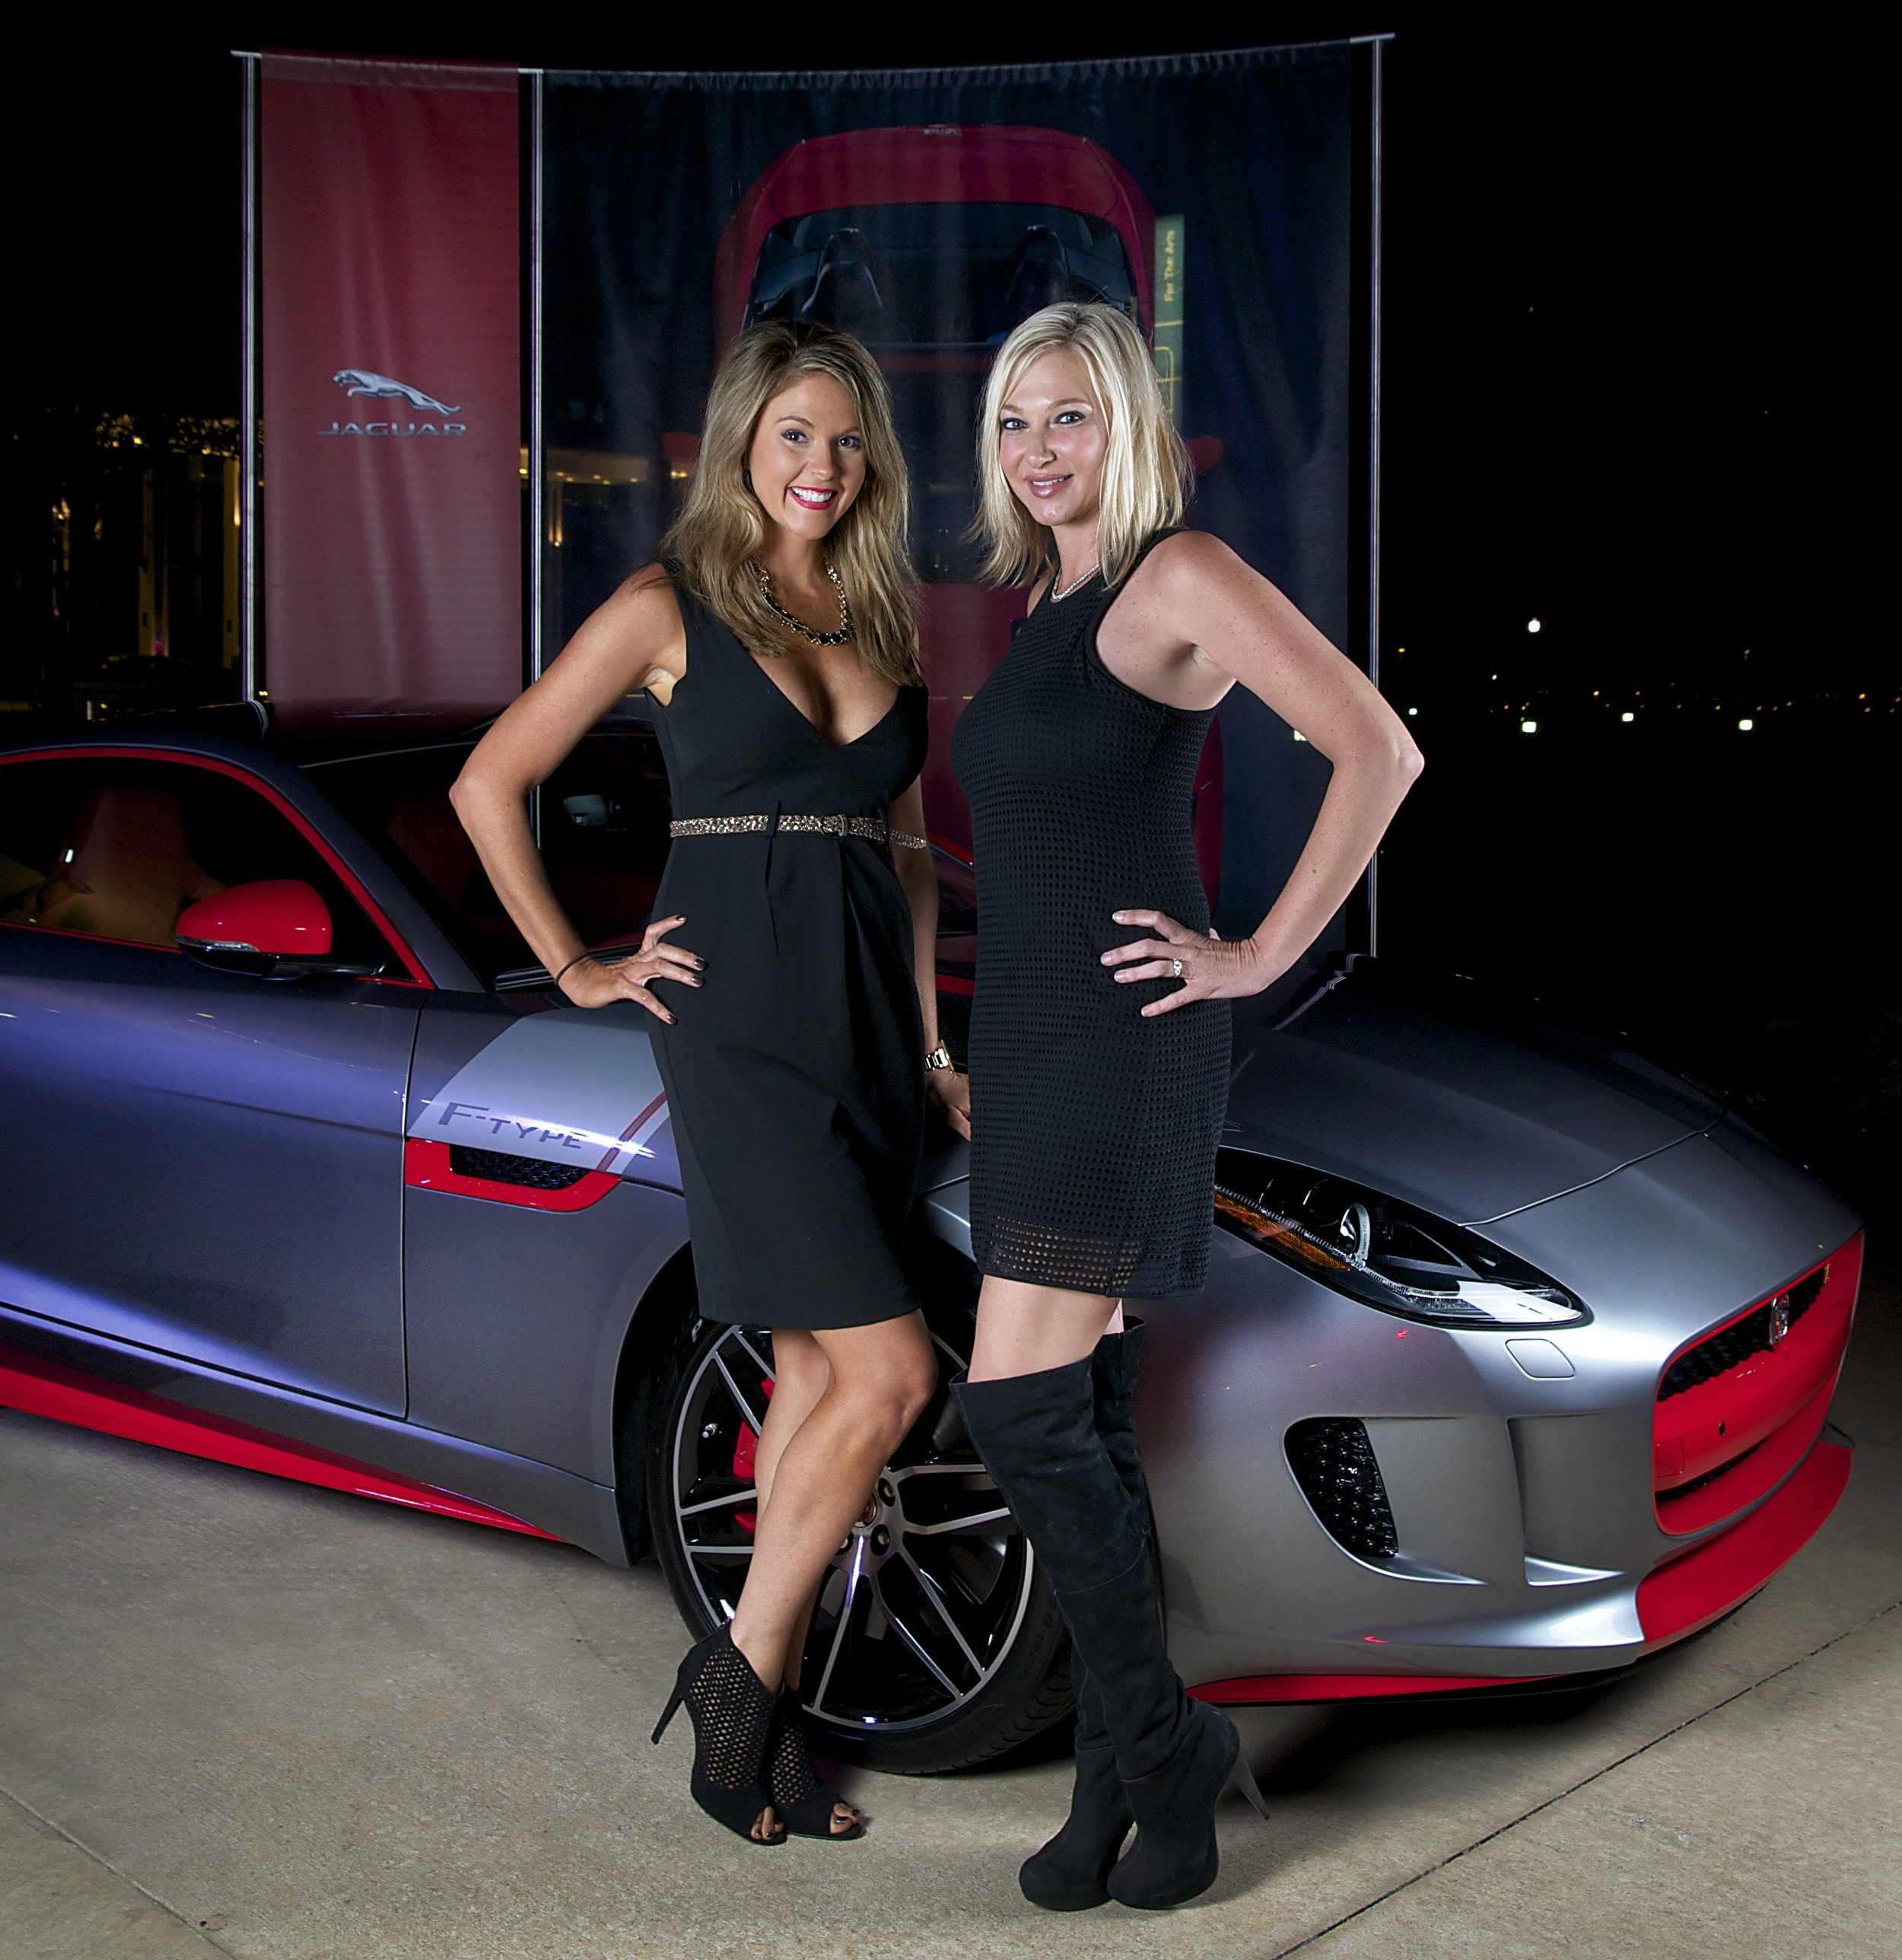 grip-grin-jaguar-car-event-florida.jpg